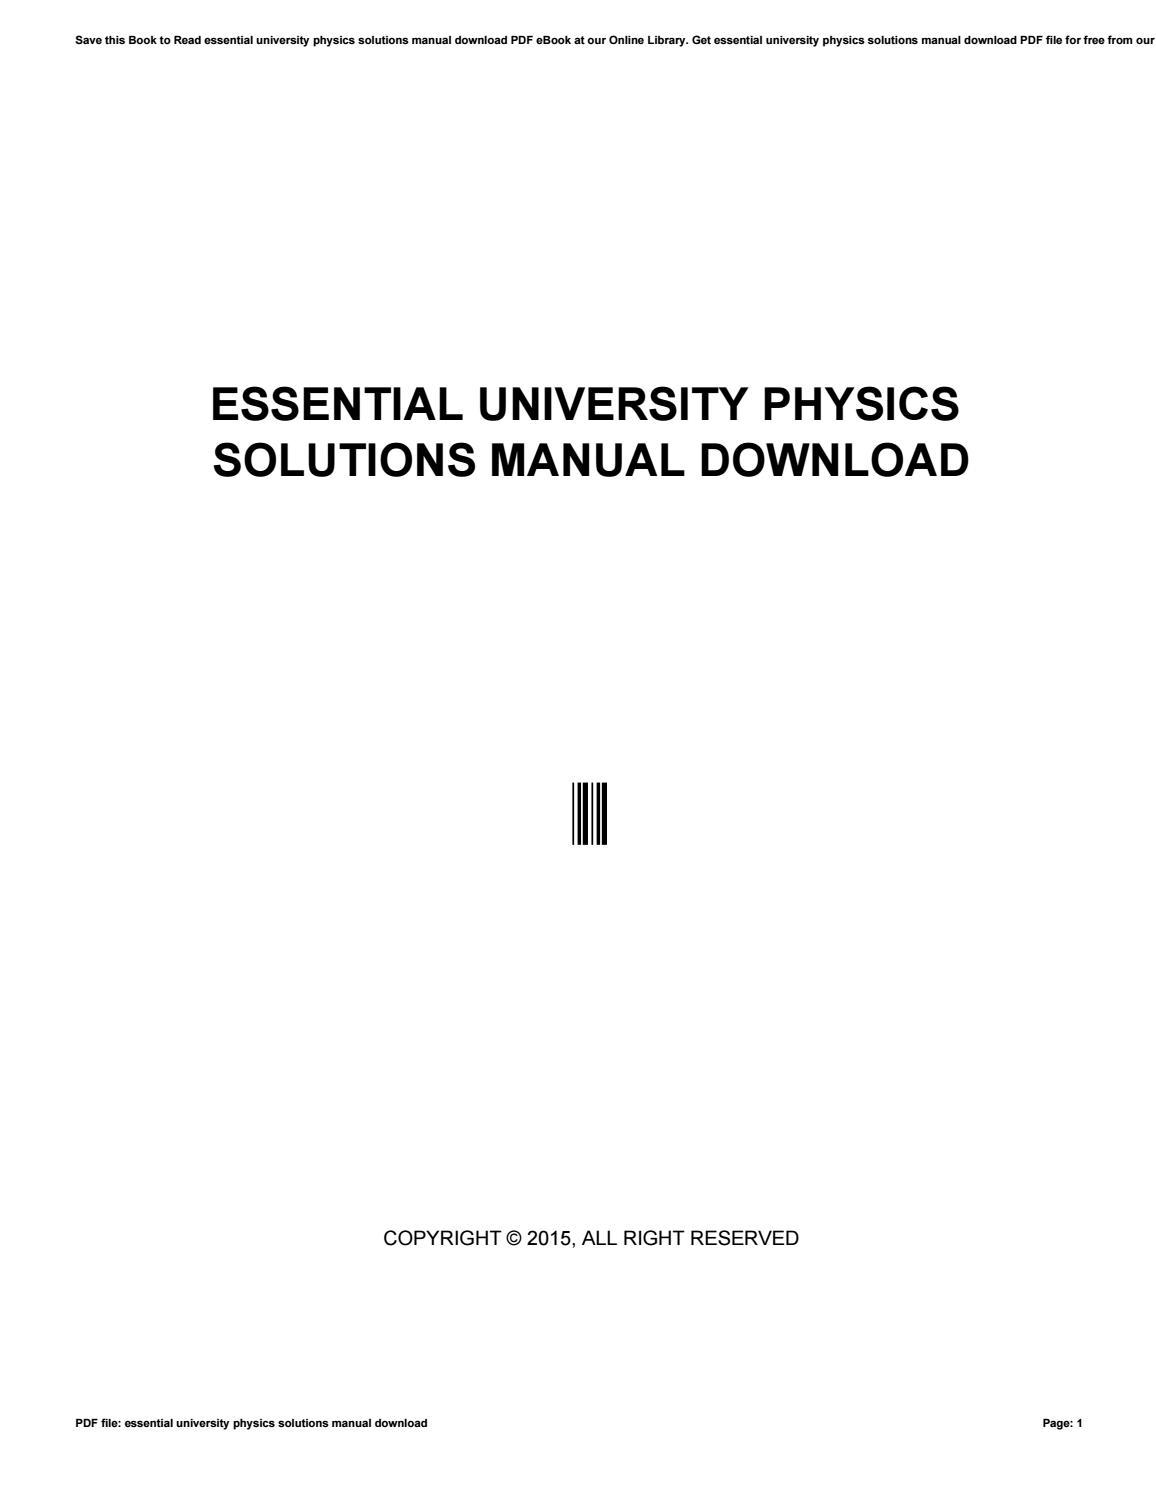 Essential university physics solutions manual download by nano98kumala -  issuu